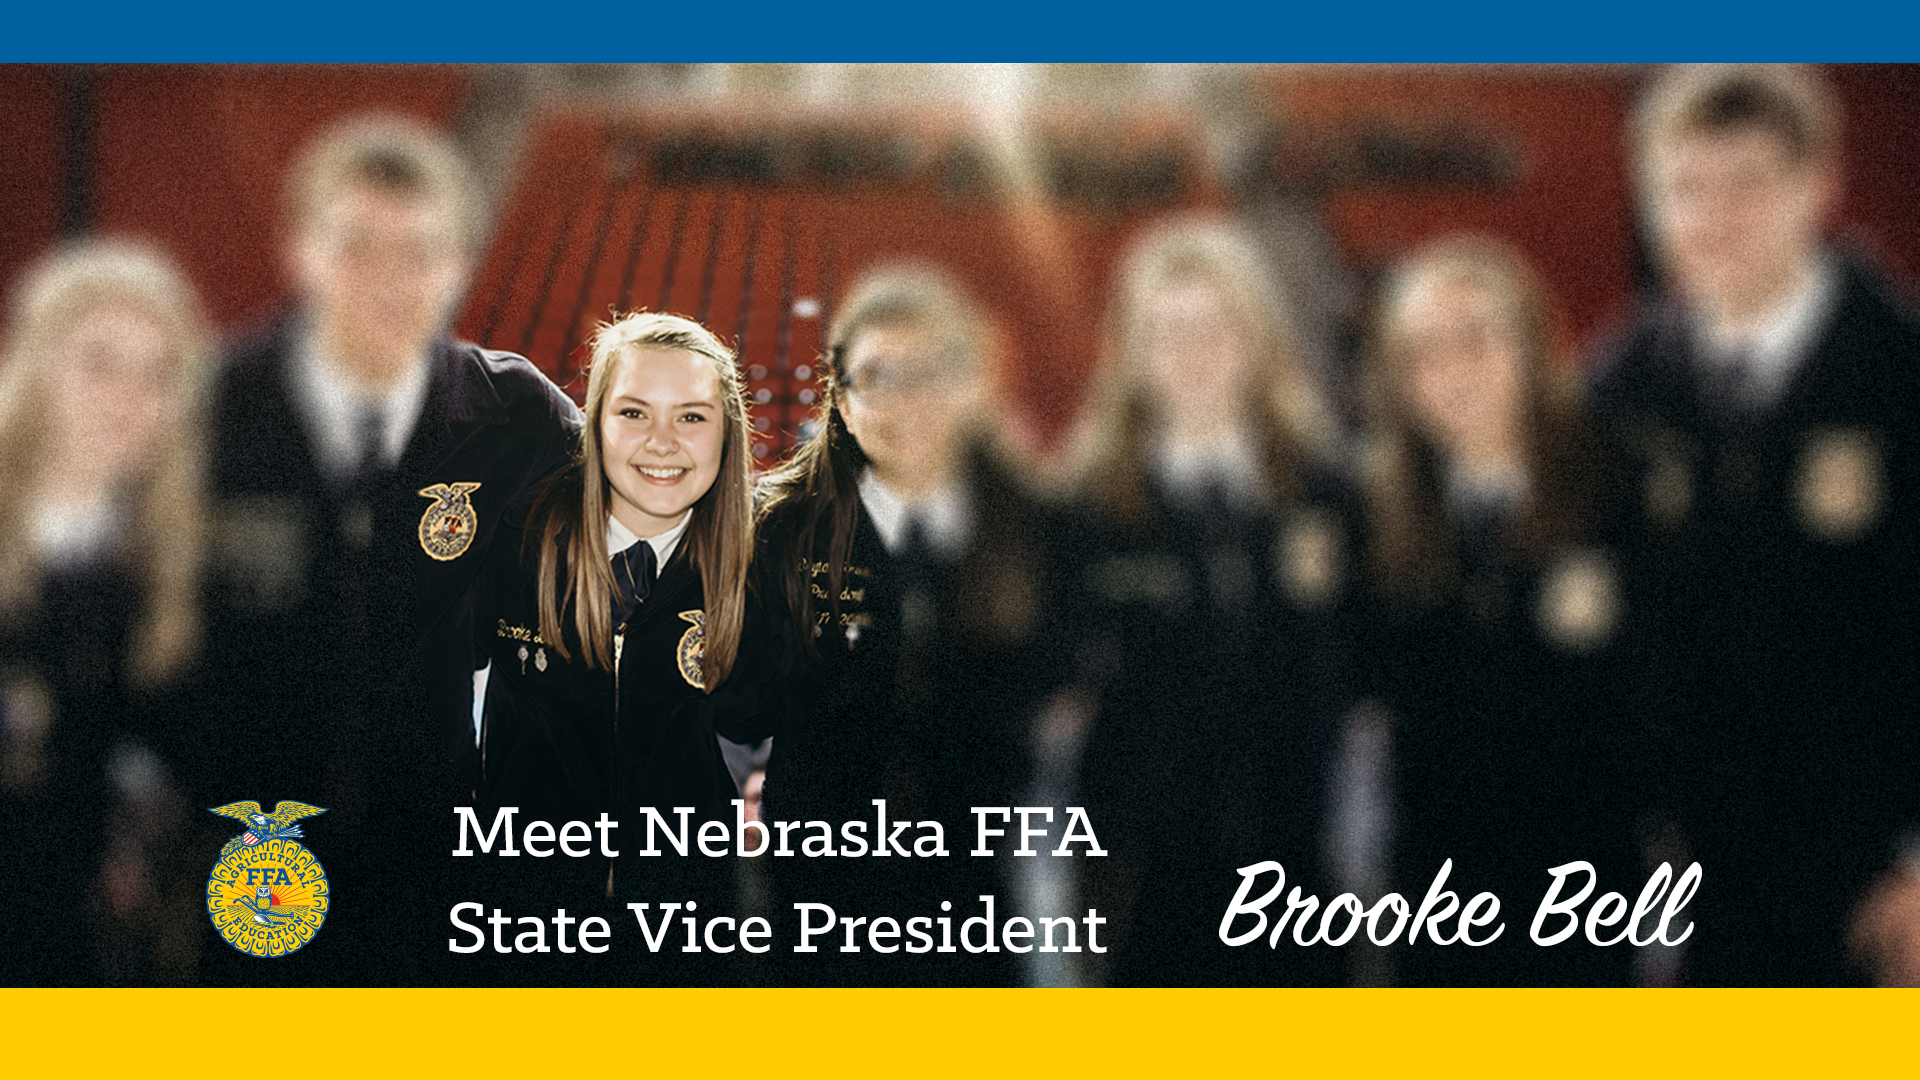 Meet Your 2018-19 Nebraska FFA State Vice President: Brooke Bell